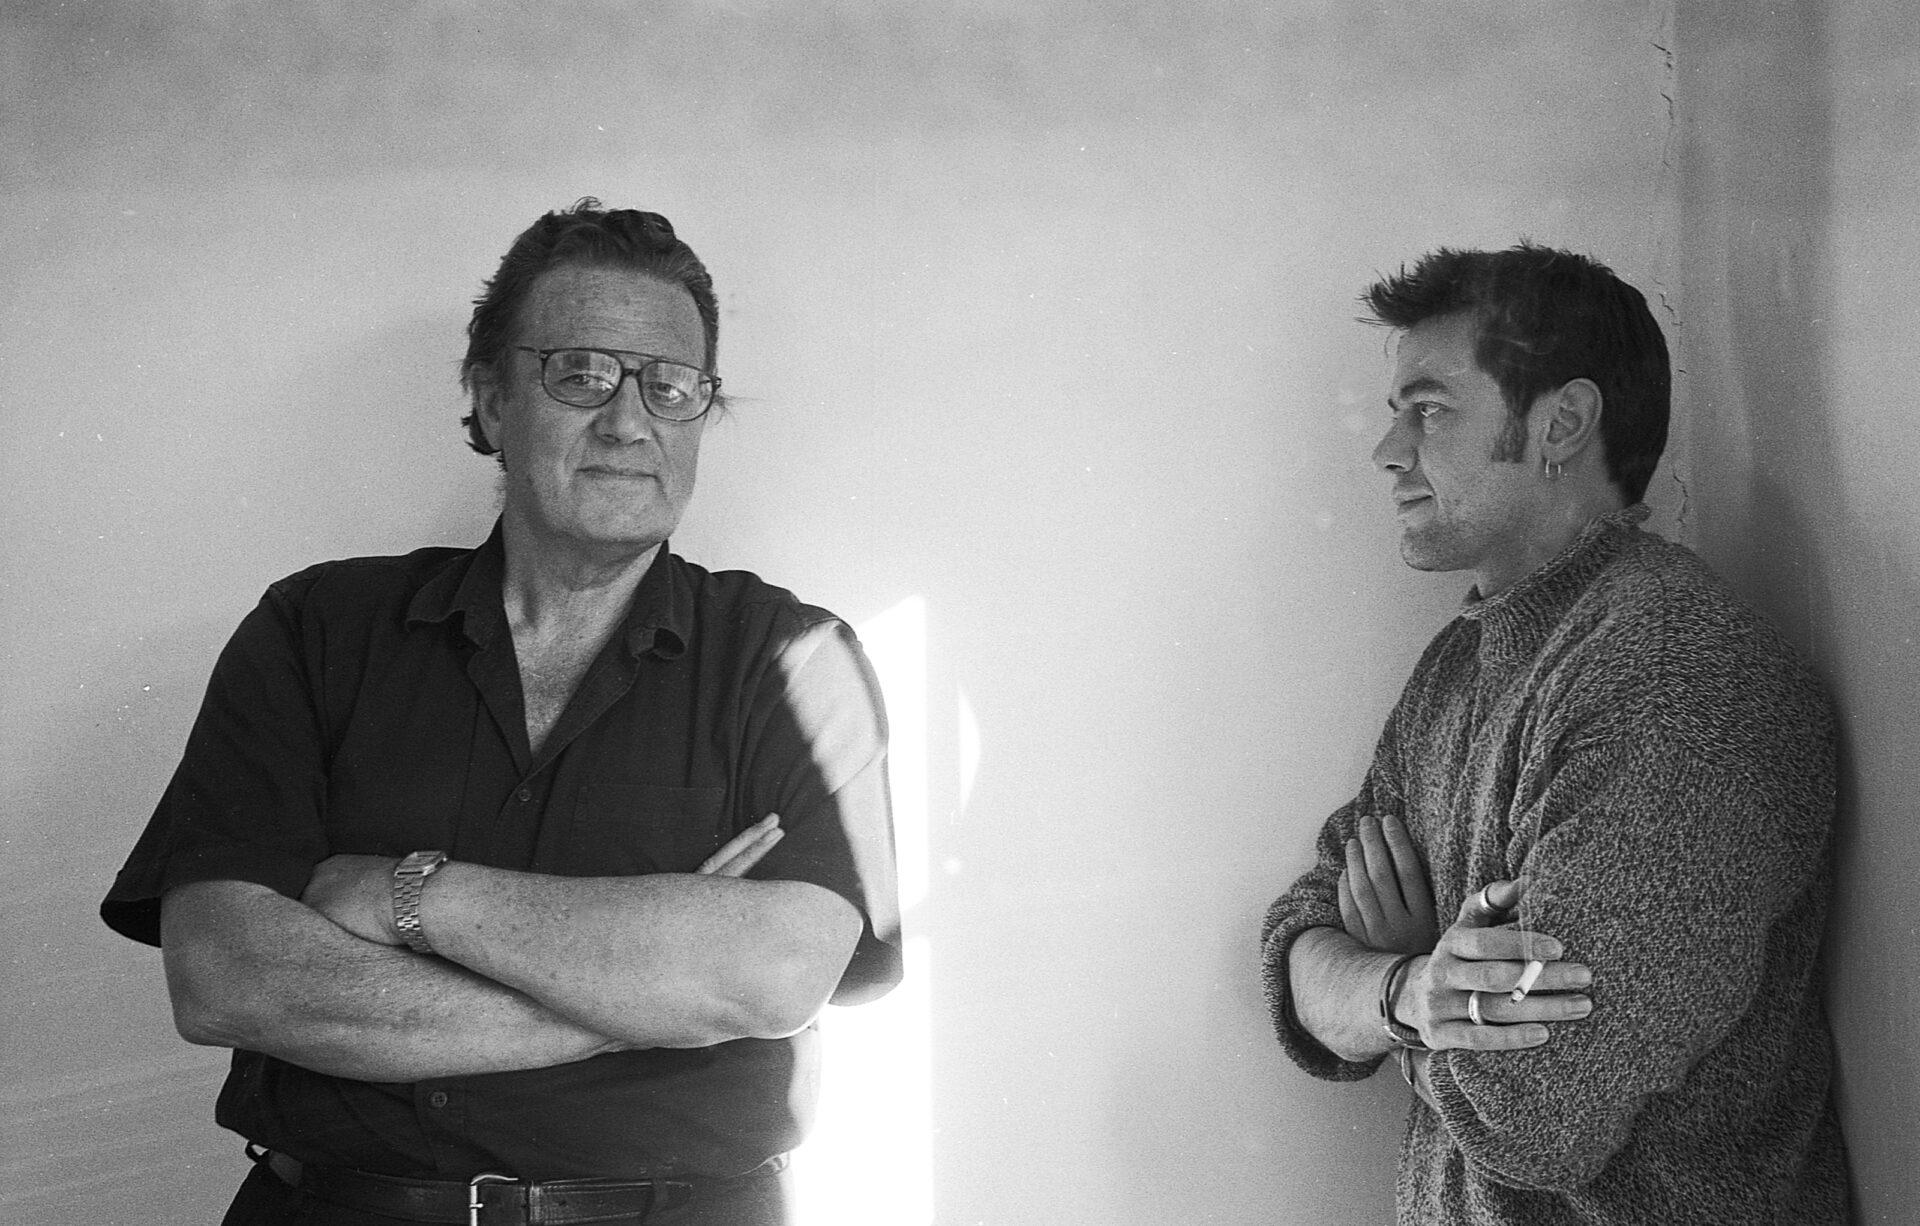 David Pownall with Peter Straughan